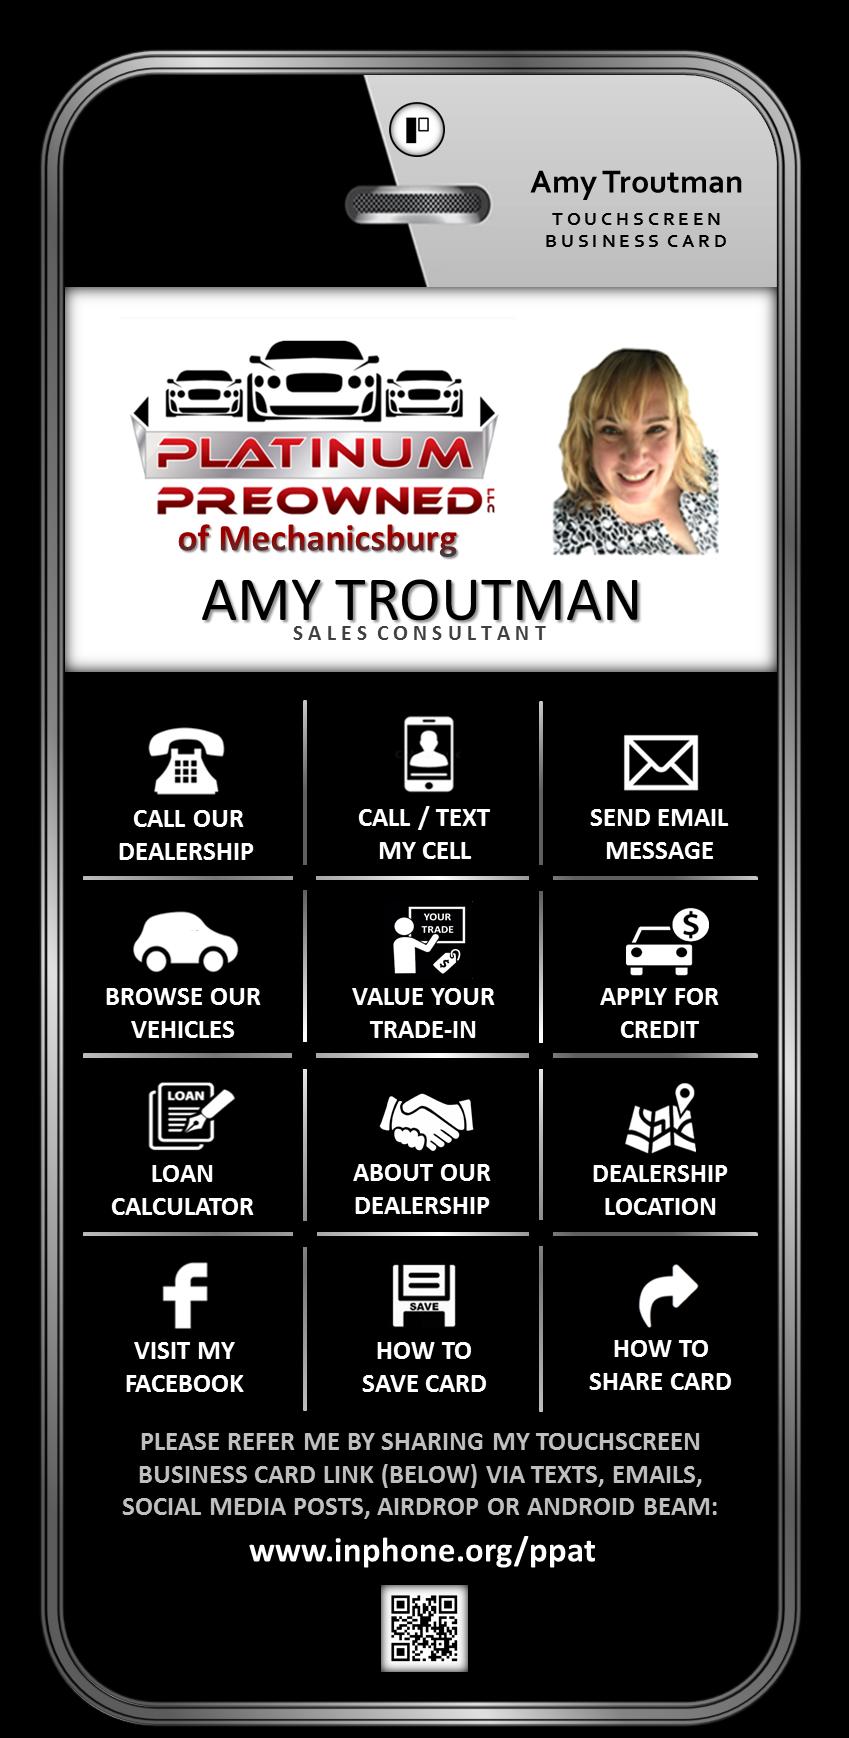 Amy Troutman - Platinum of Mechanicsburg